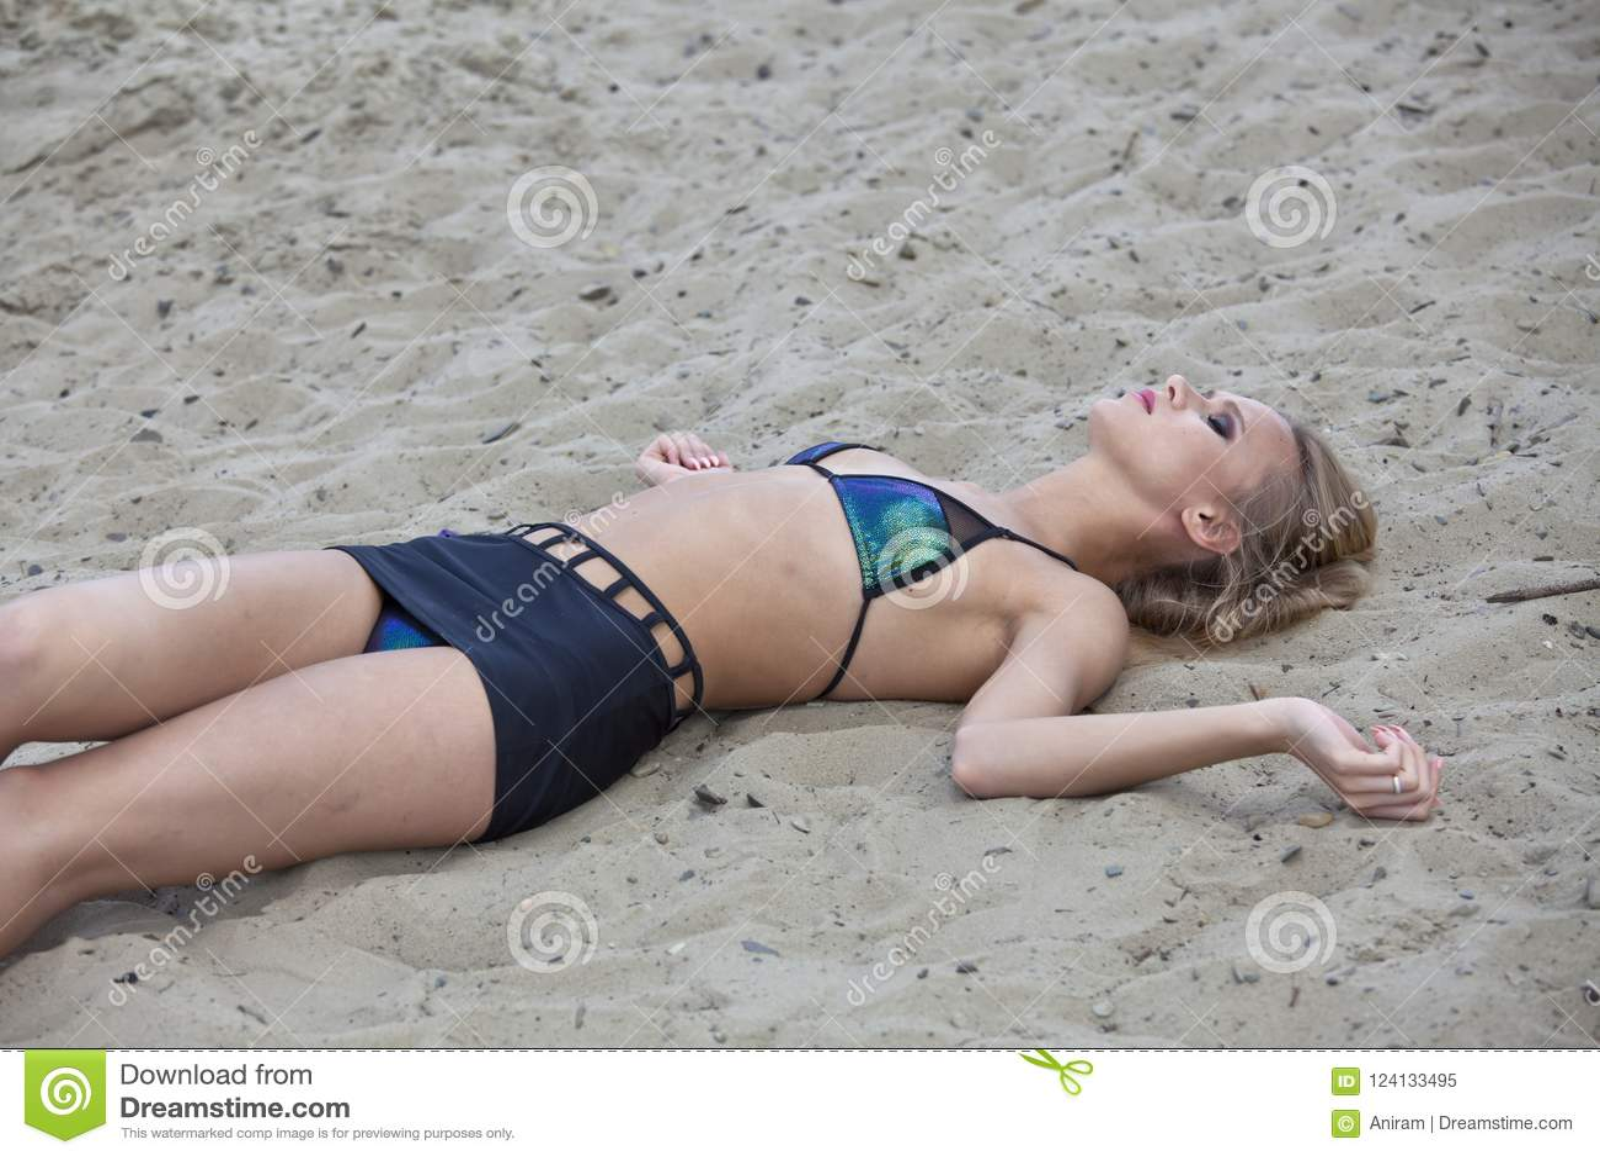 Cena do crime na praia